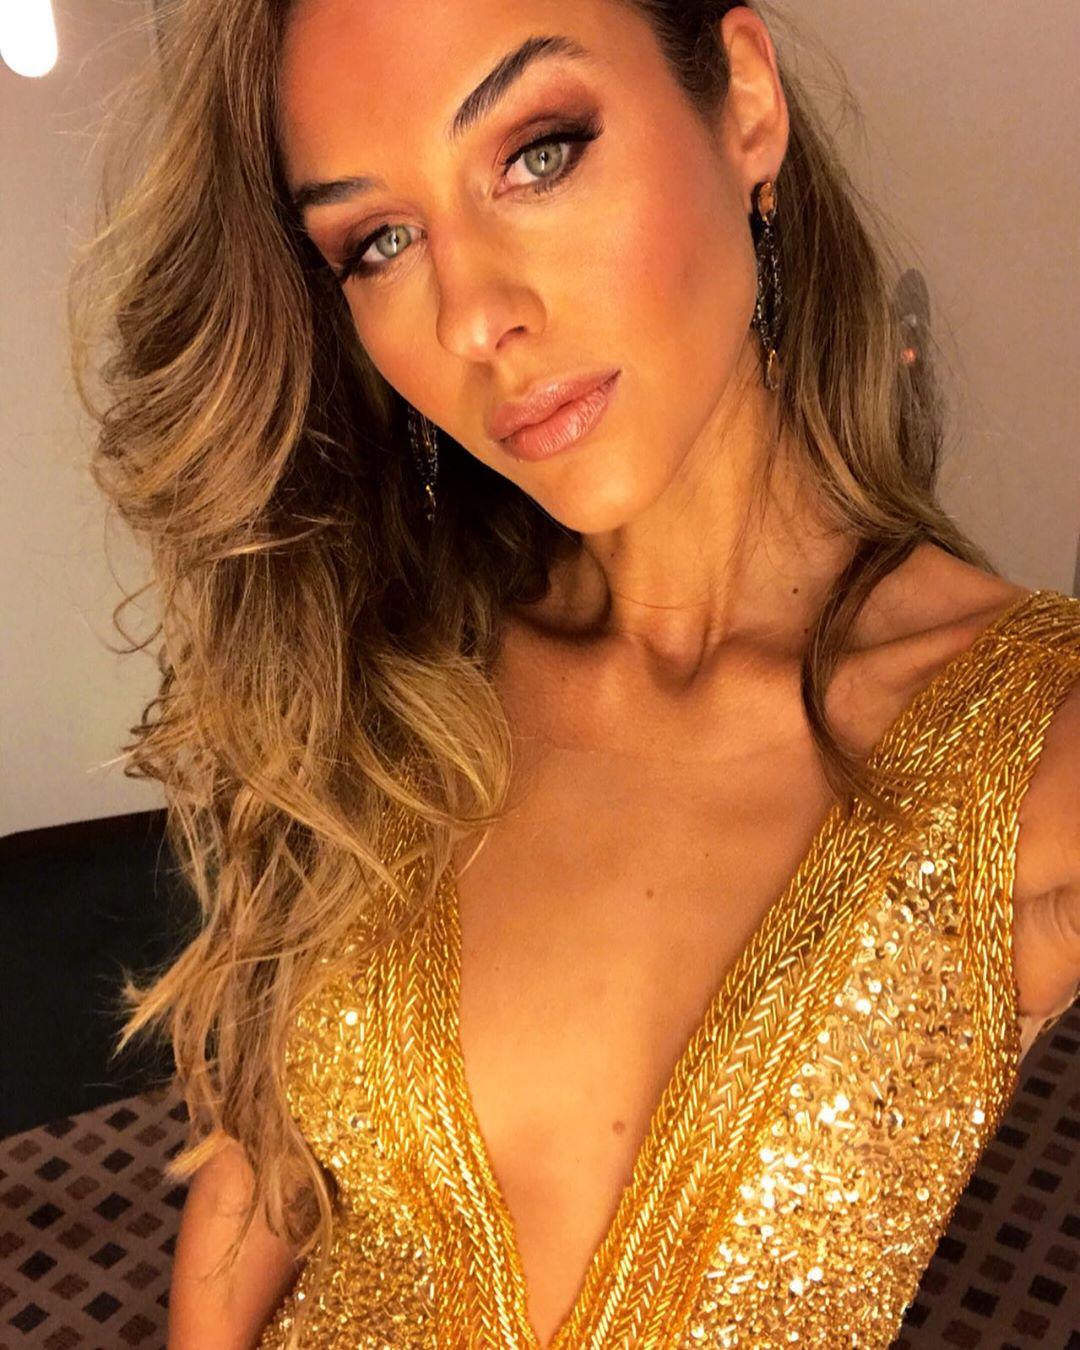 carolina stankevicius, miss brasil internacional 2019. - Página 5 71518310